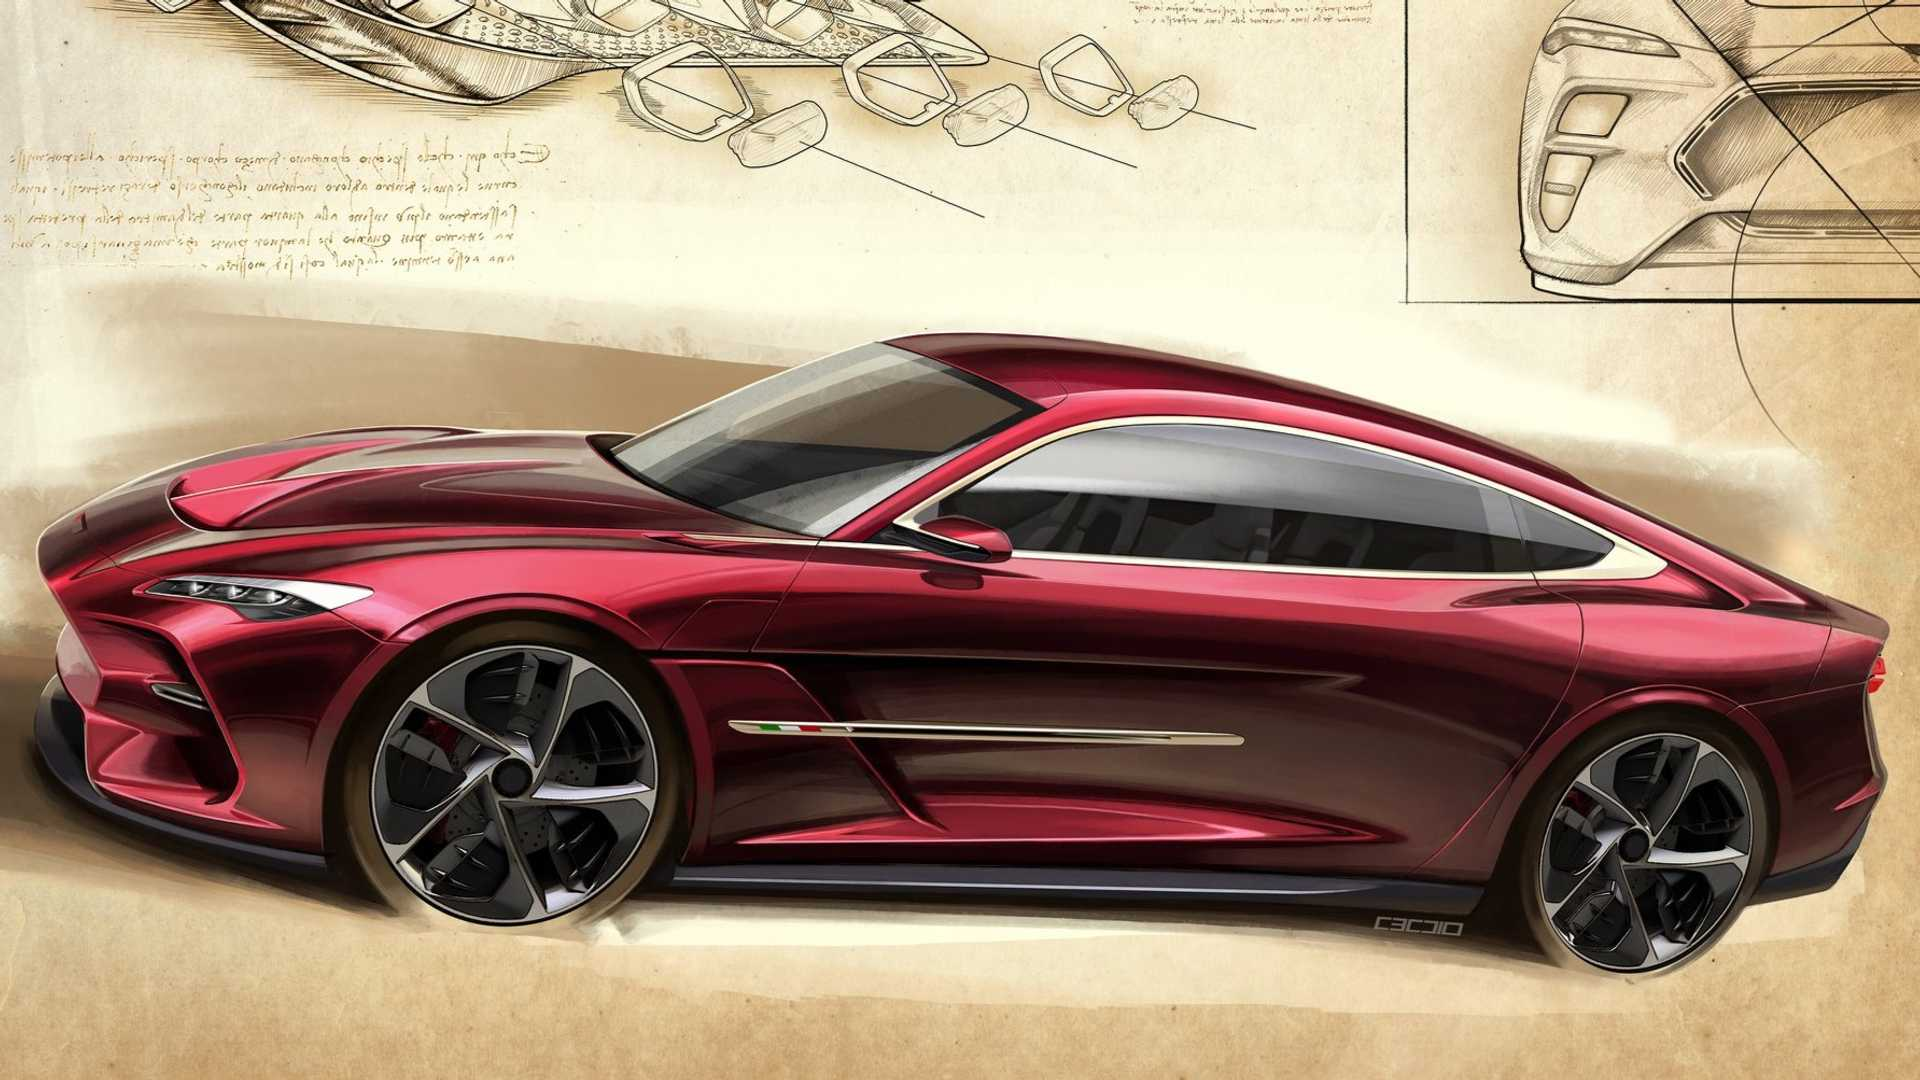 Italdesign Reveals Stunning Coupe Ahead Of Geneva Premiere